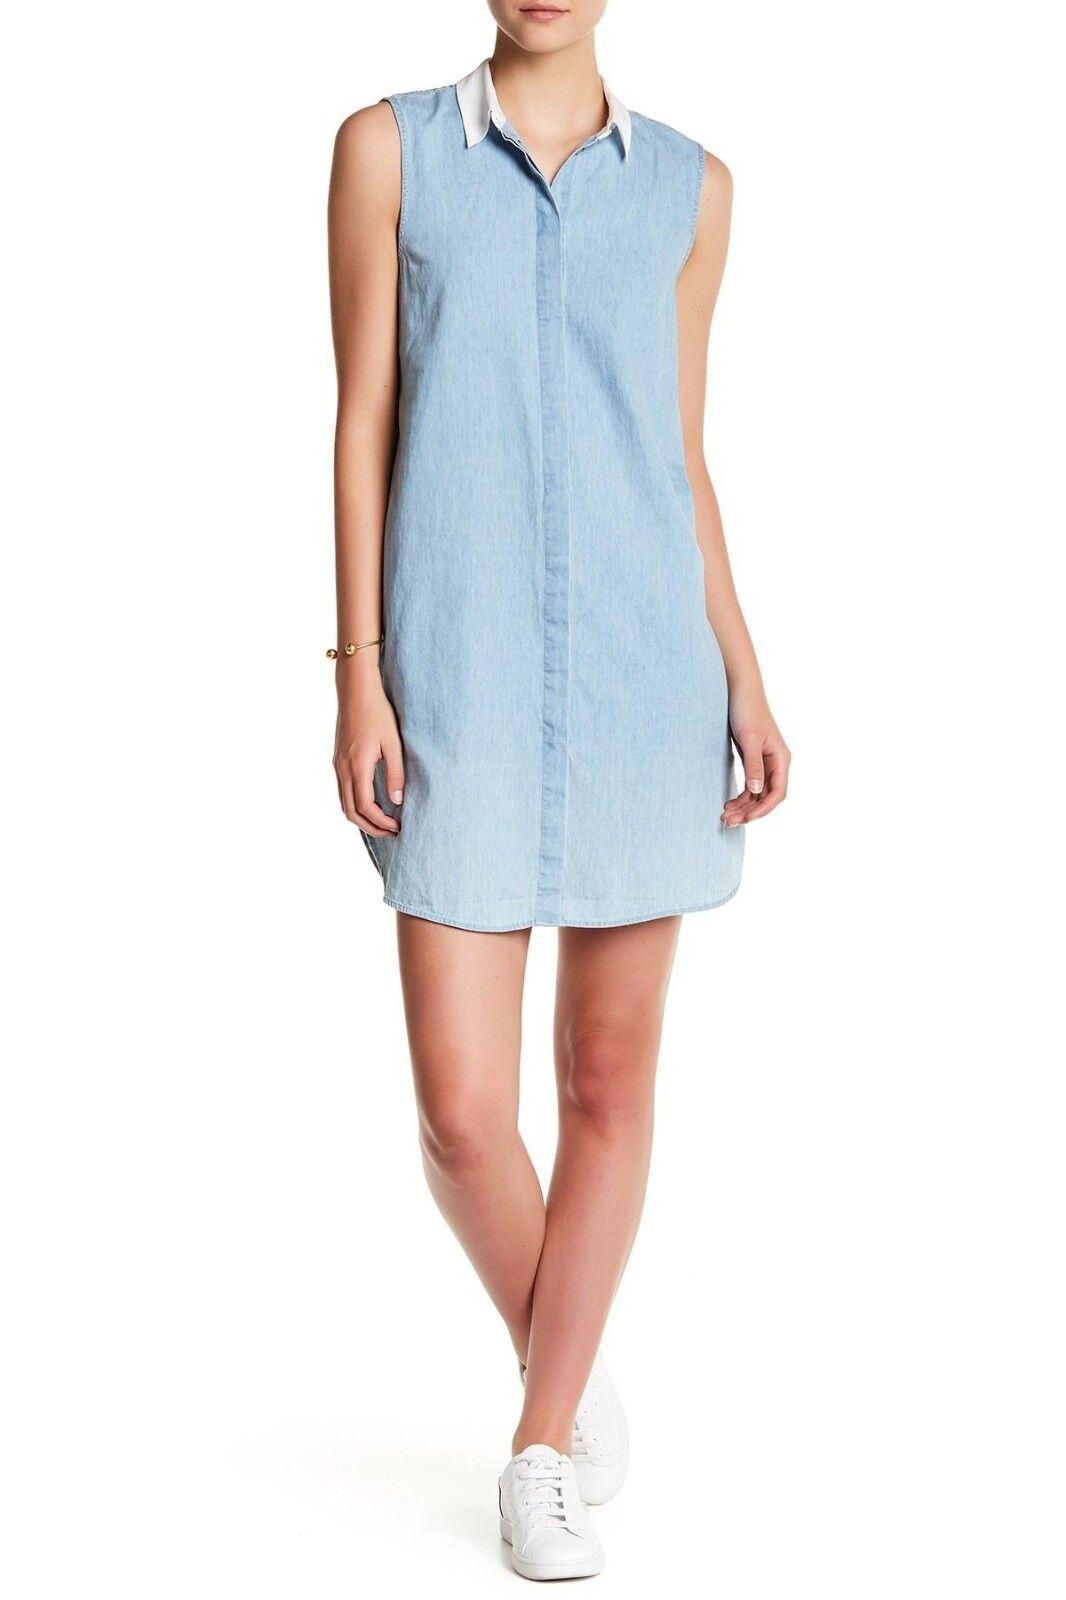 NEW Equipment bluee Lanie Sleeveless Dress - Size L  218